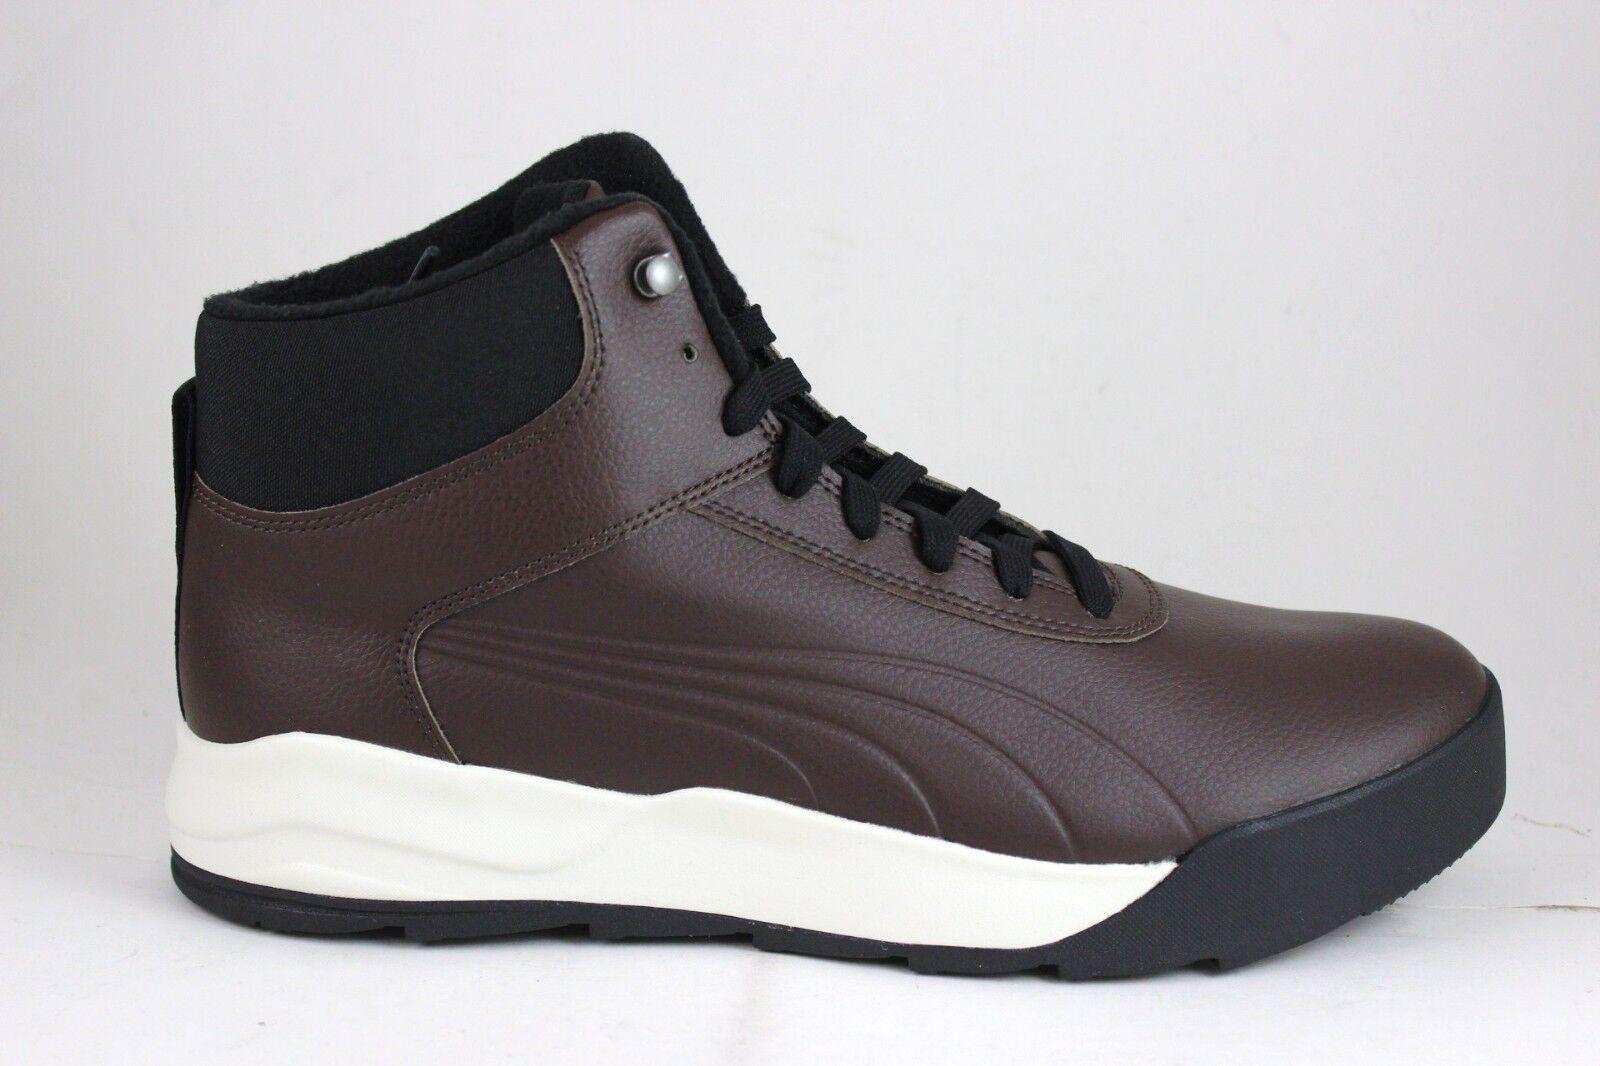 Men's PUMA Desierto Sneaker L Brown Chocolate 362065 03 Brand New